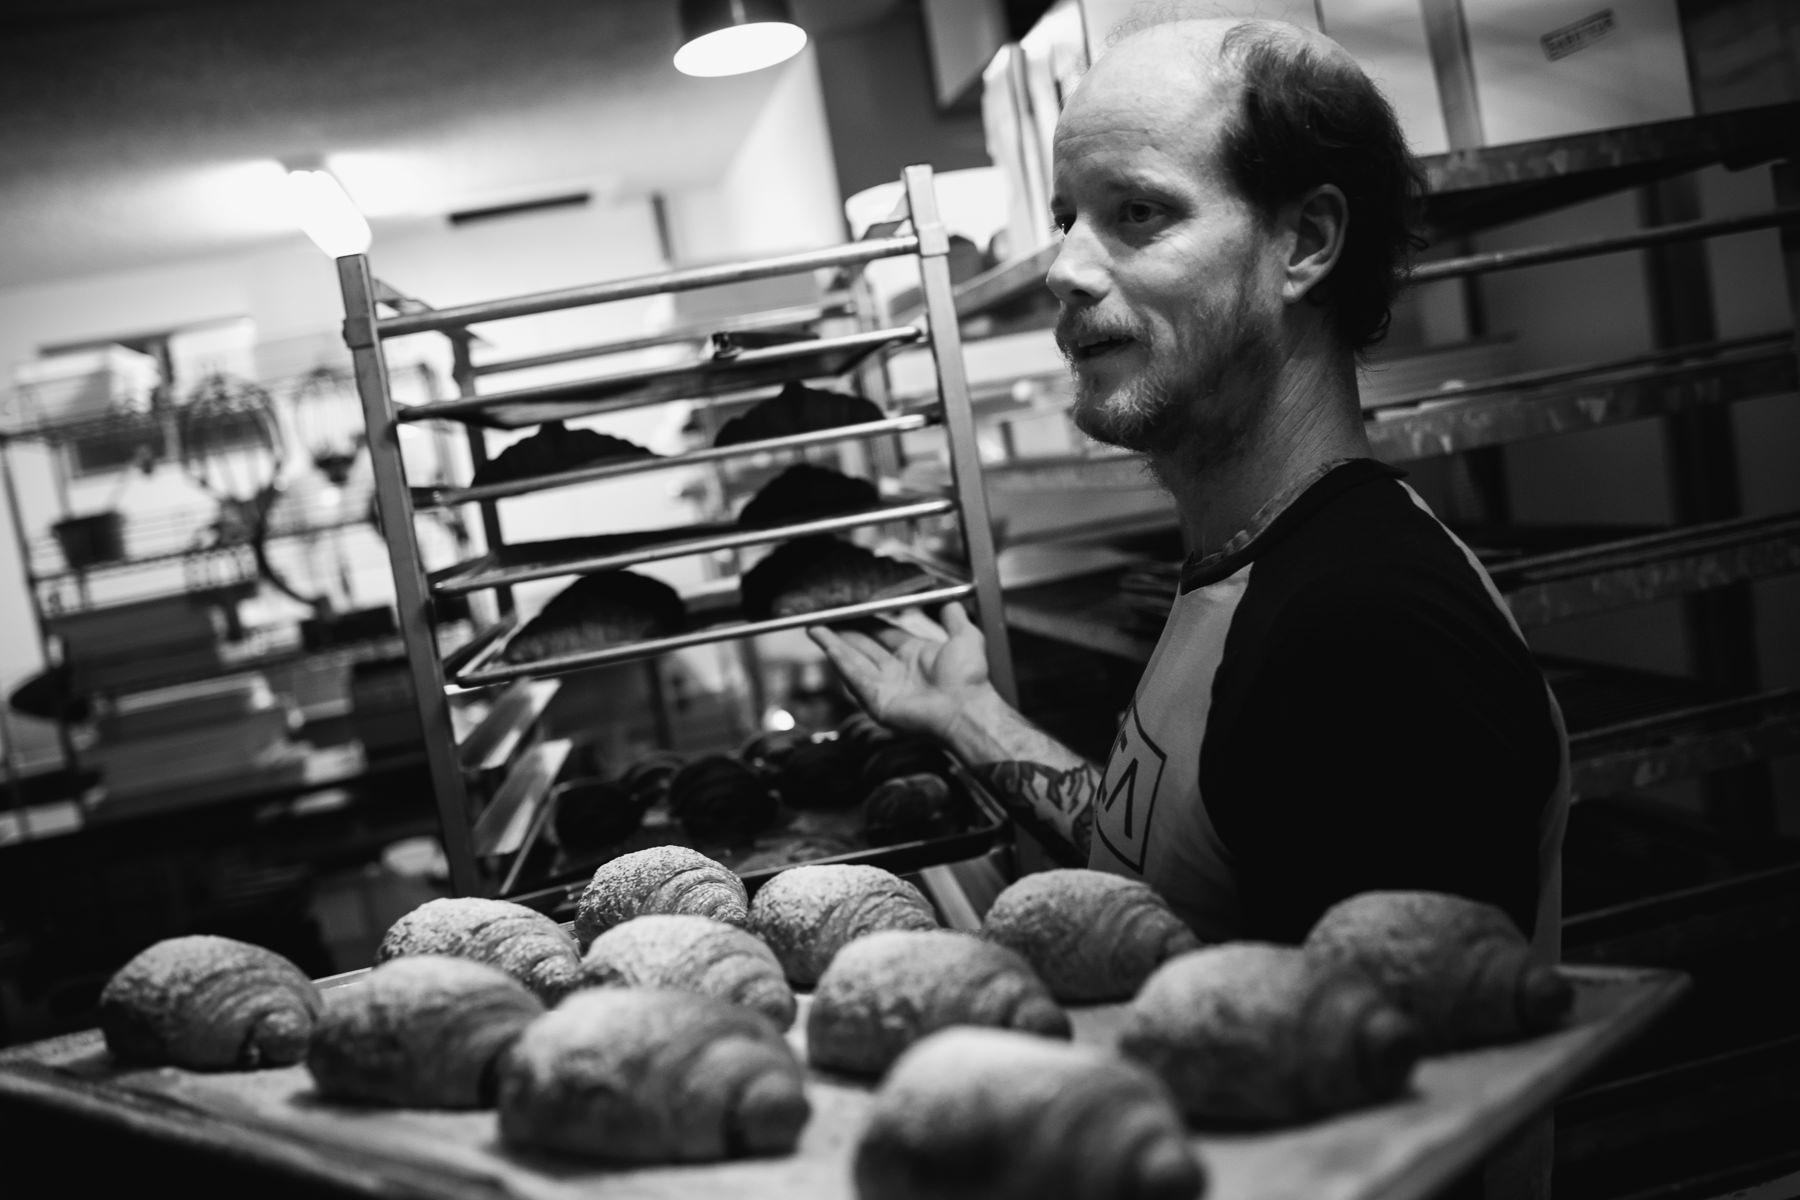 matt-tinder-saboteur-bakery-bremerton-wa-36